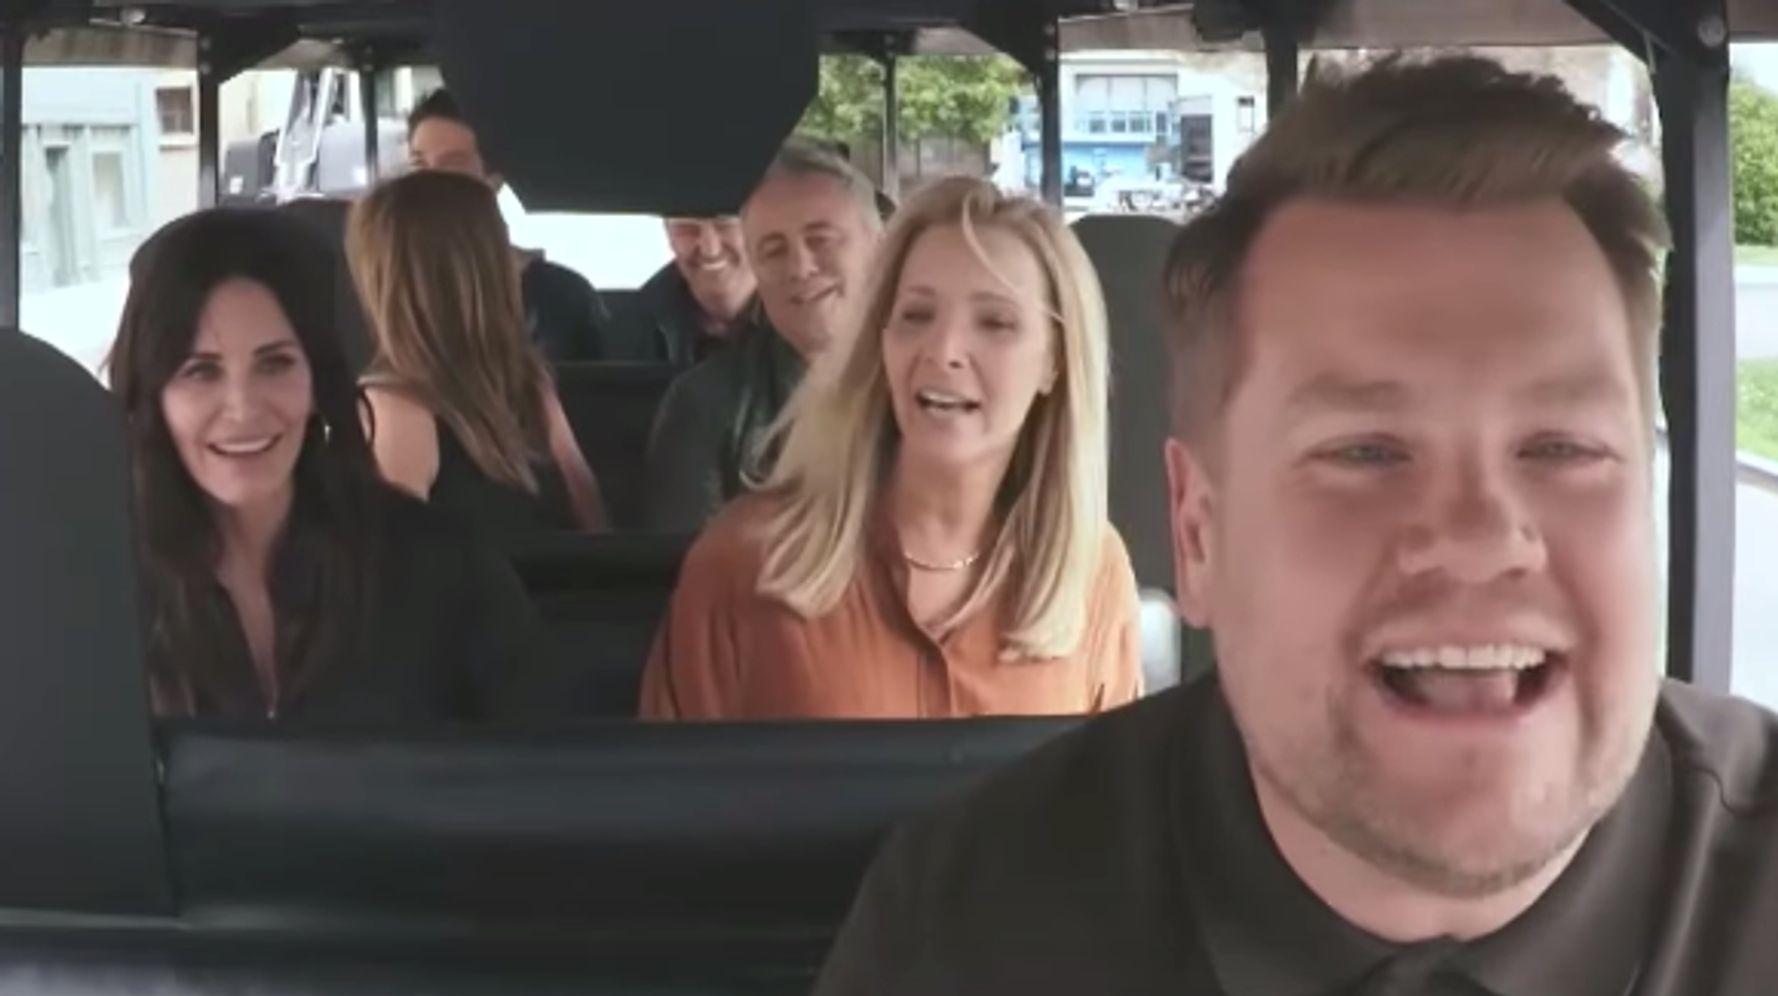 'Friends' Stars Do Mini 'Carpool Karaoke,' James Corden 'Nearly' Kills Them